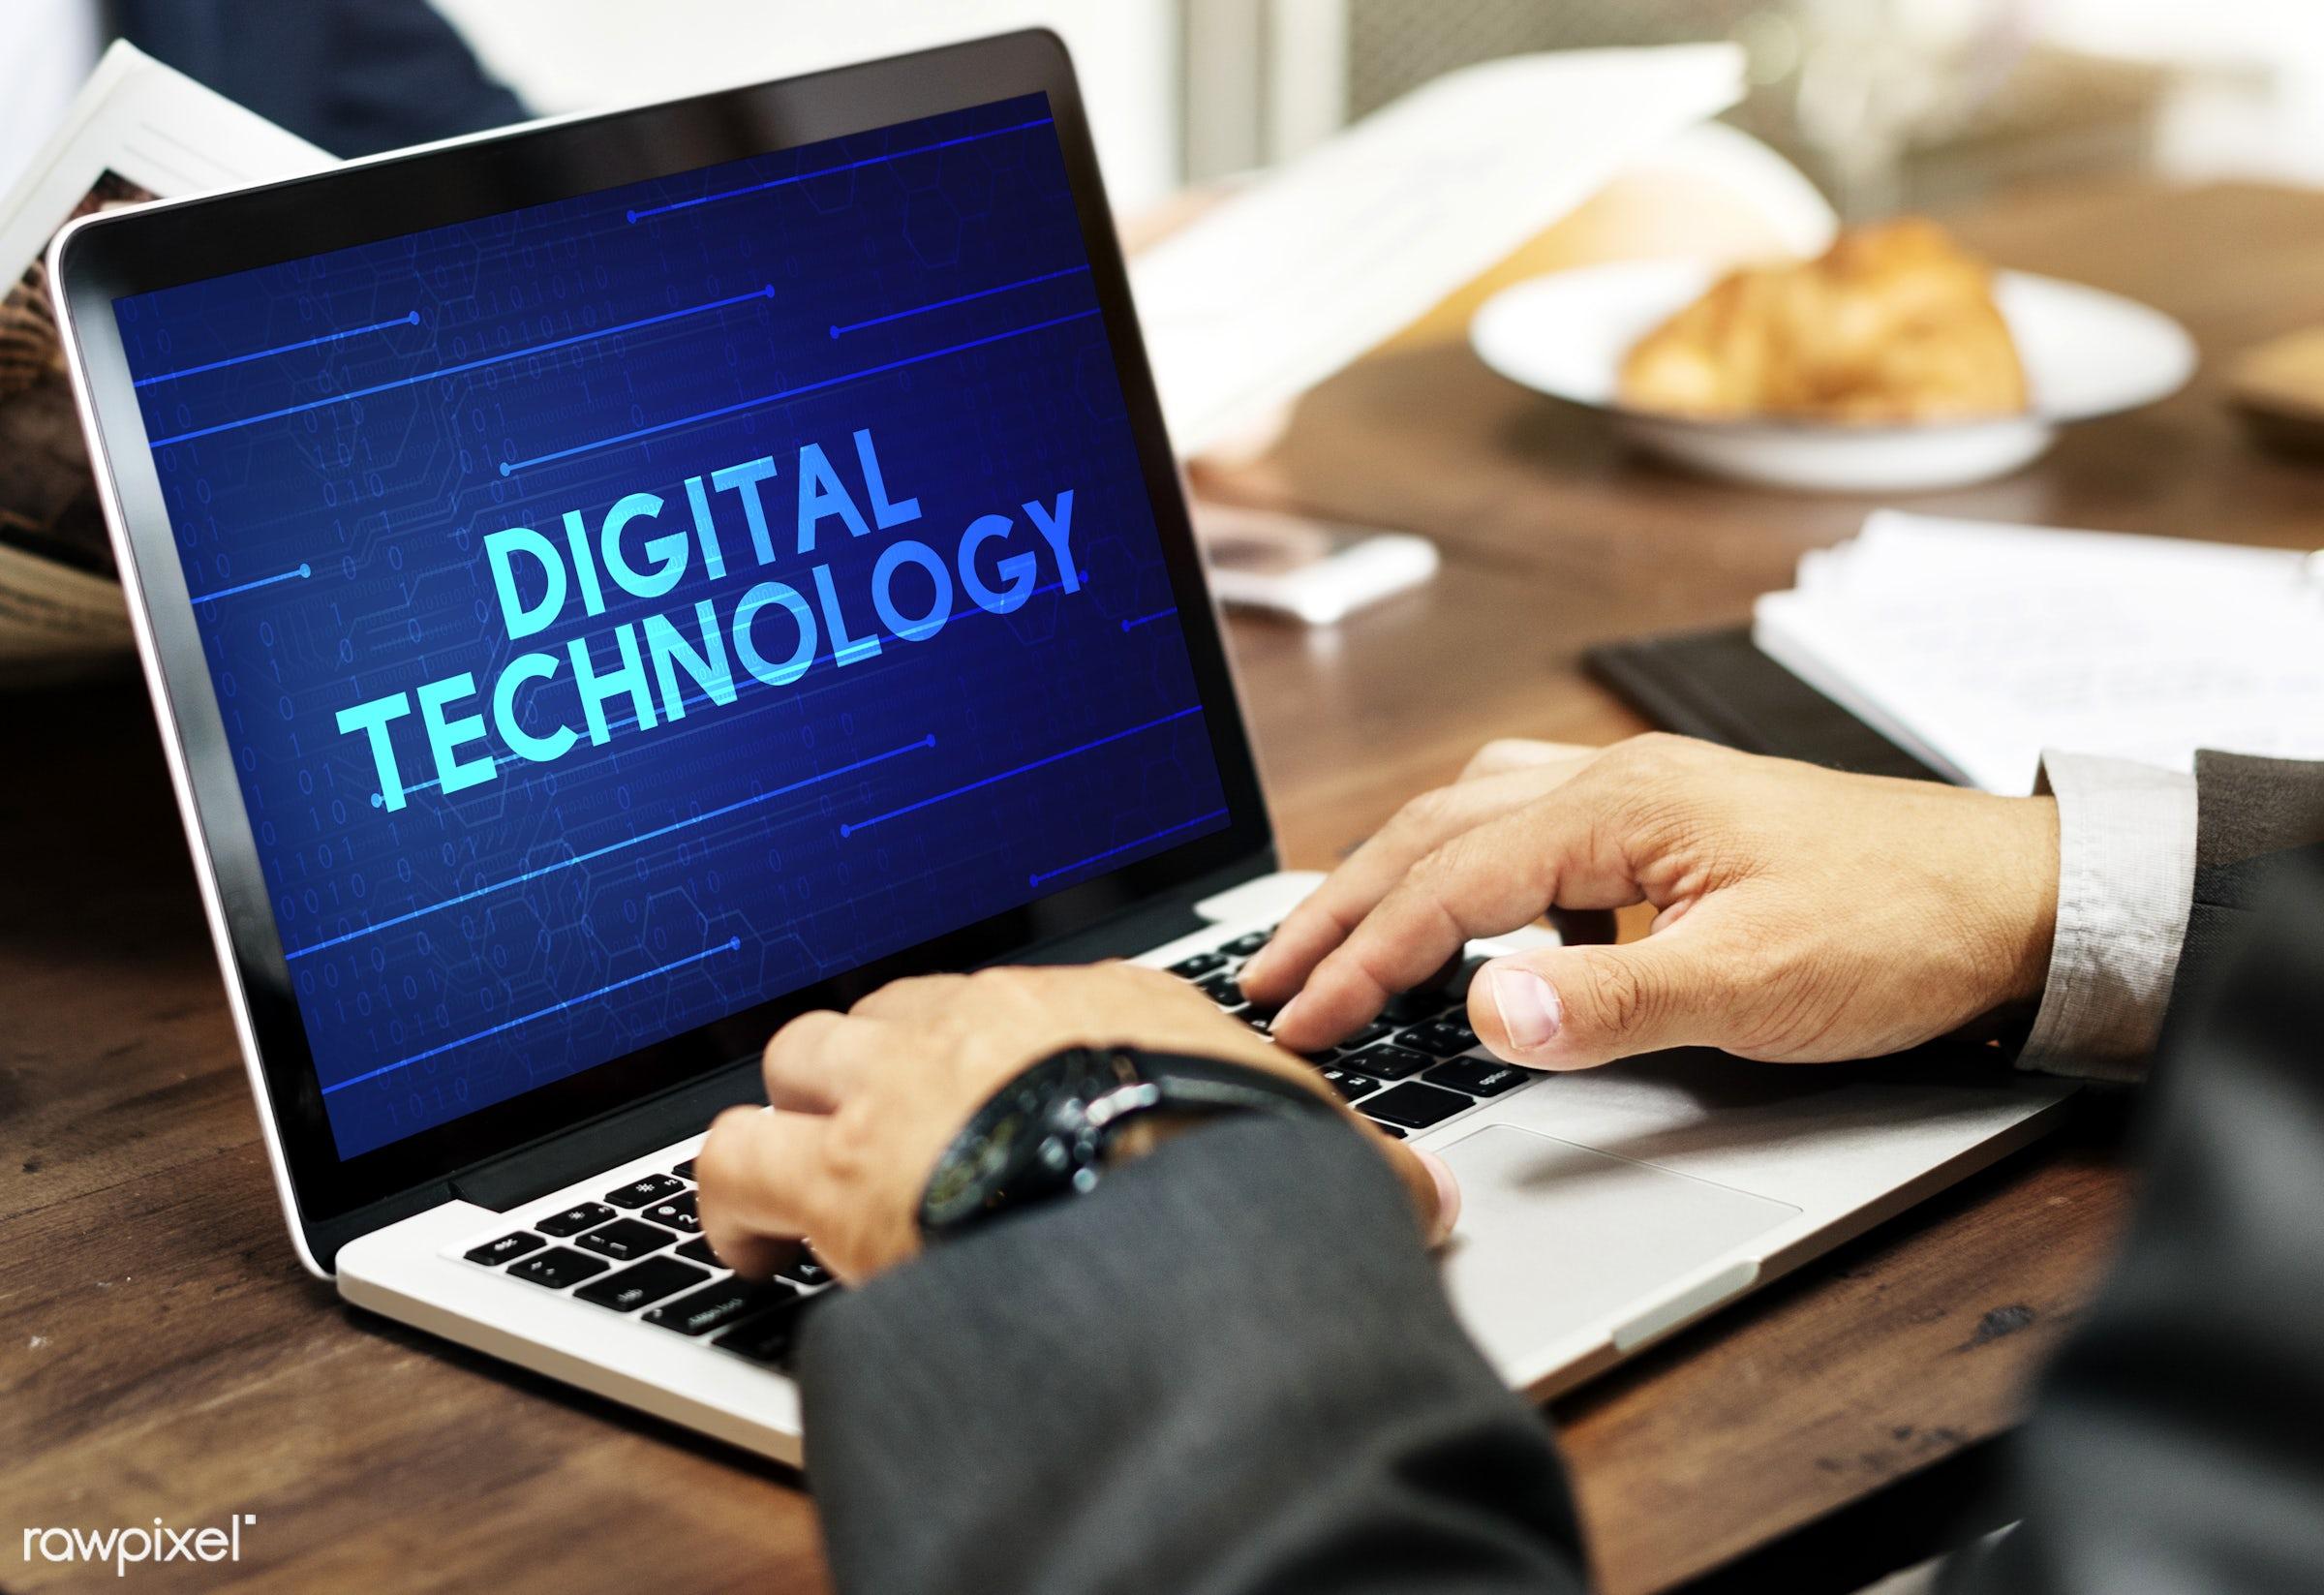 browse, business, businessman, cafe, cloud, communication, connection, corporate, data, development, device, digital,...